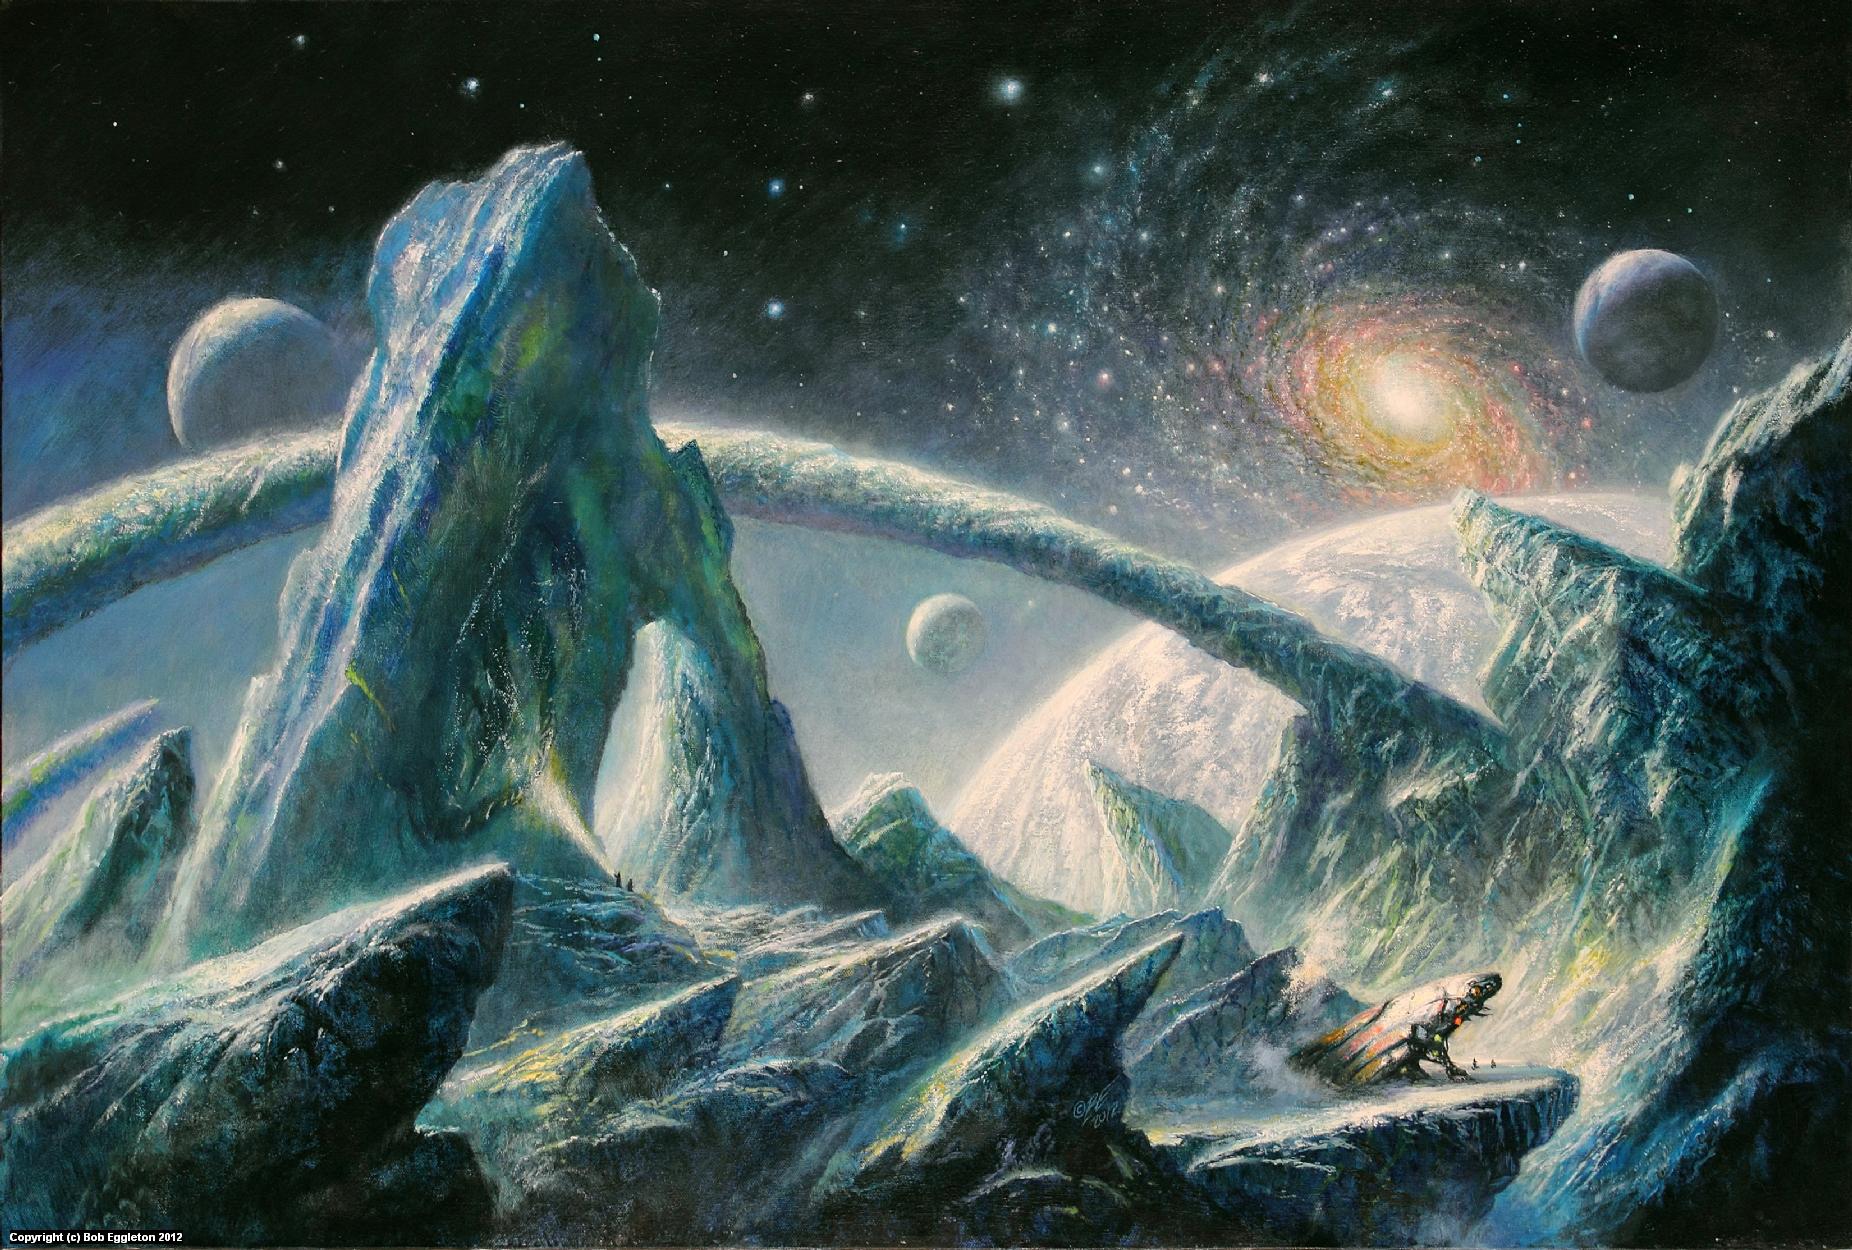 THE MULTIVERSE Artwork by Bob Eggleton